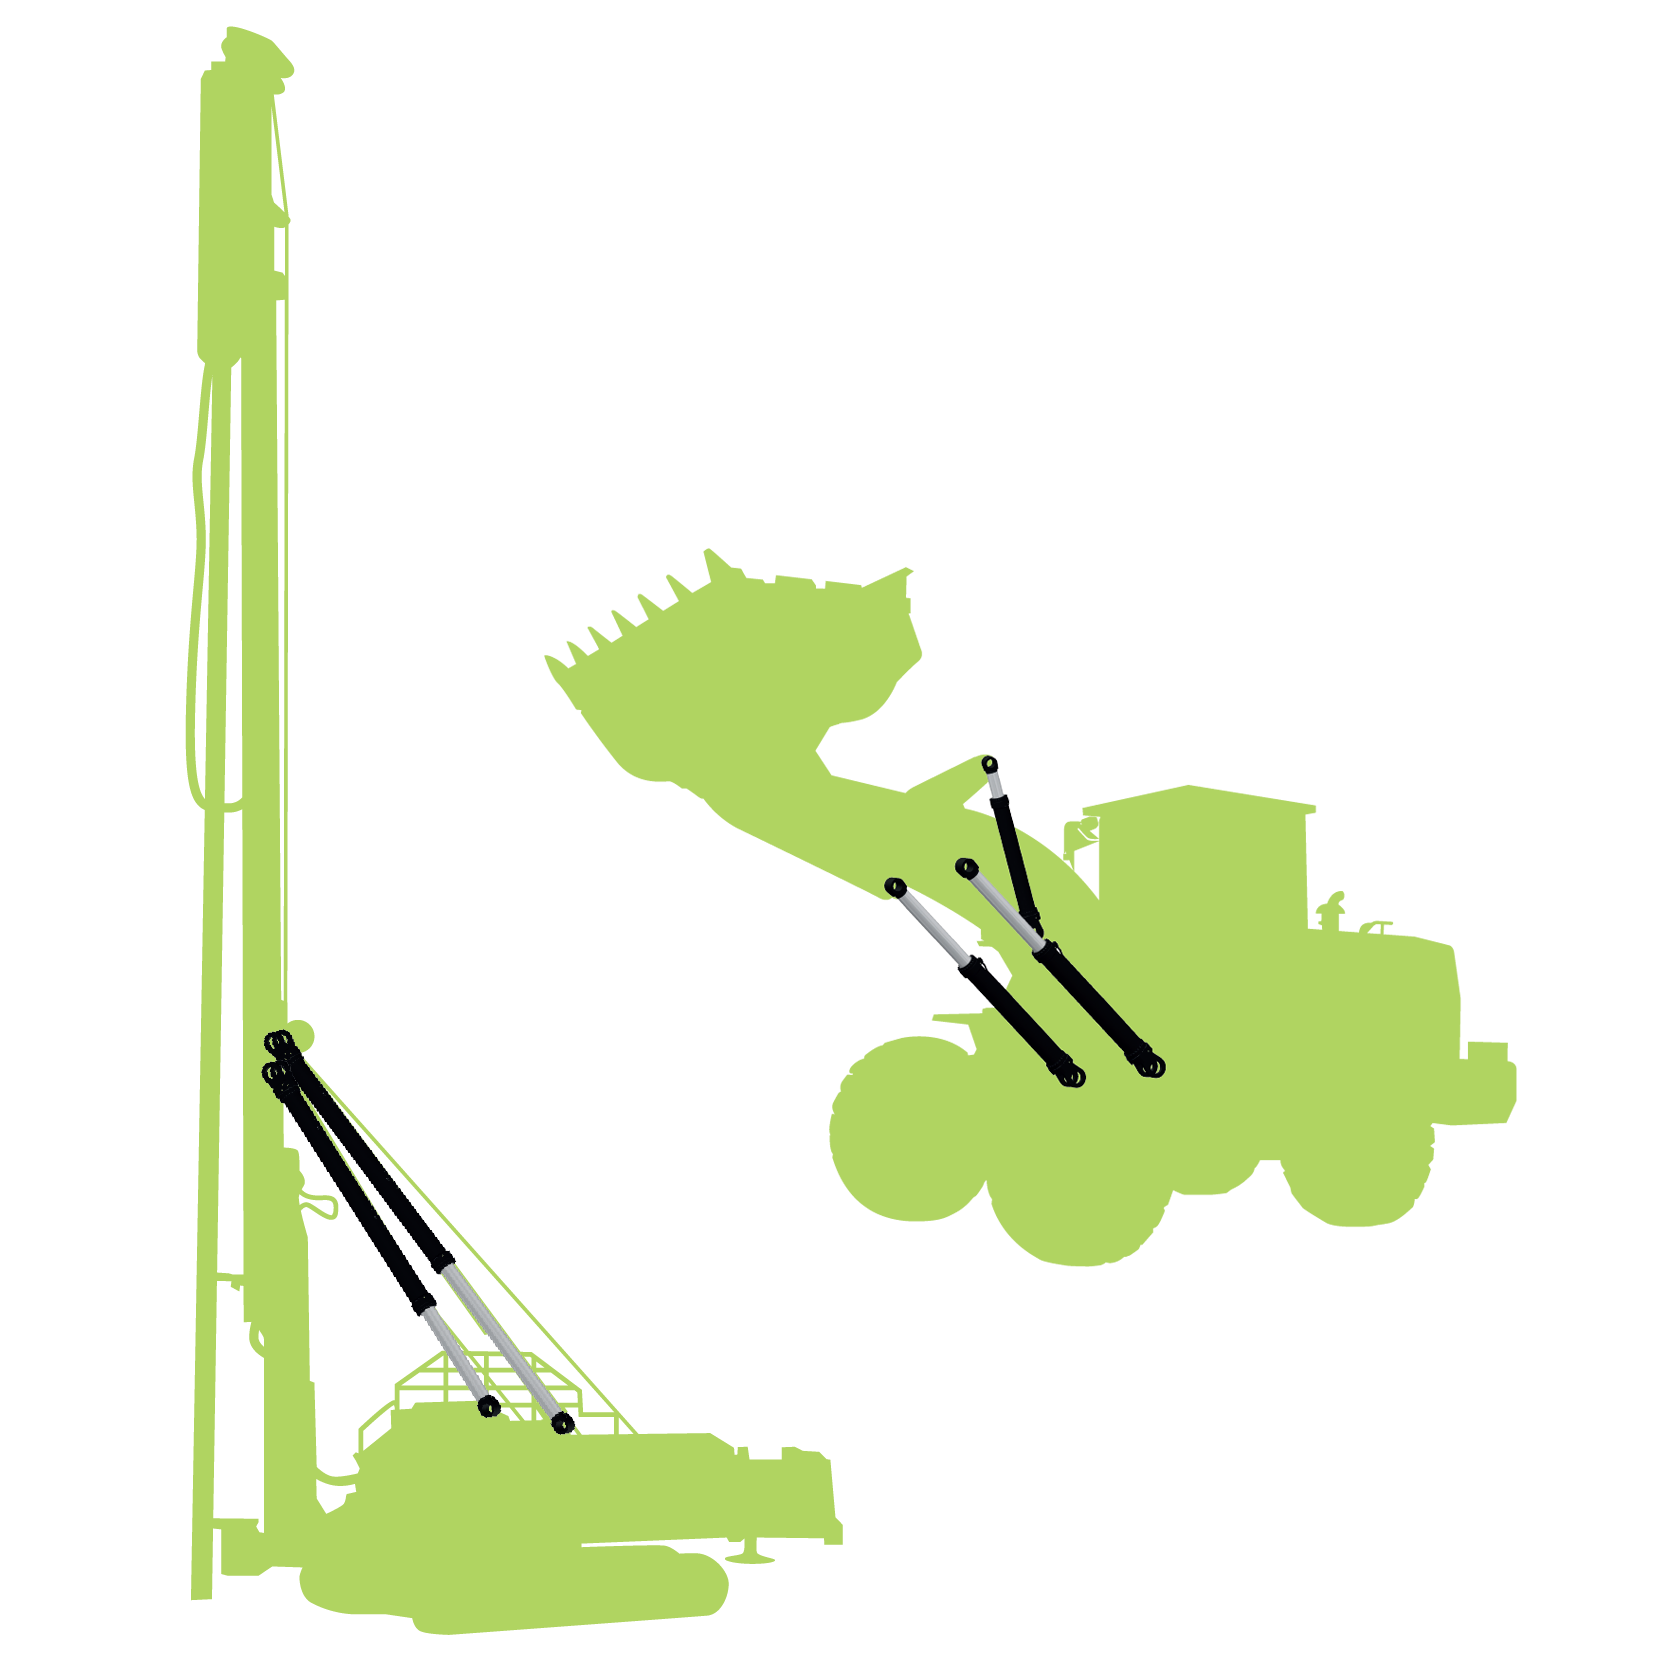 NH_web_construction_equipment-new